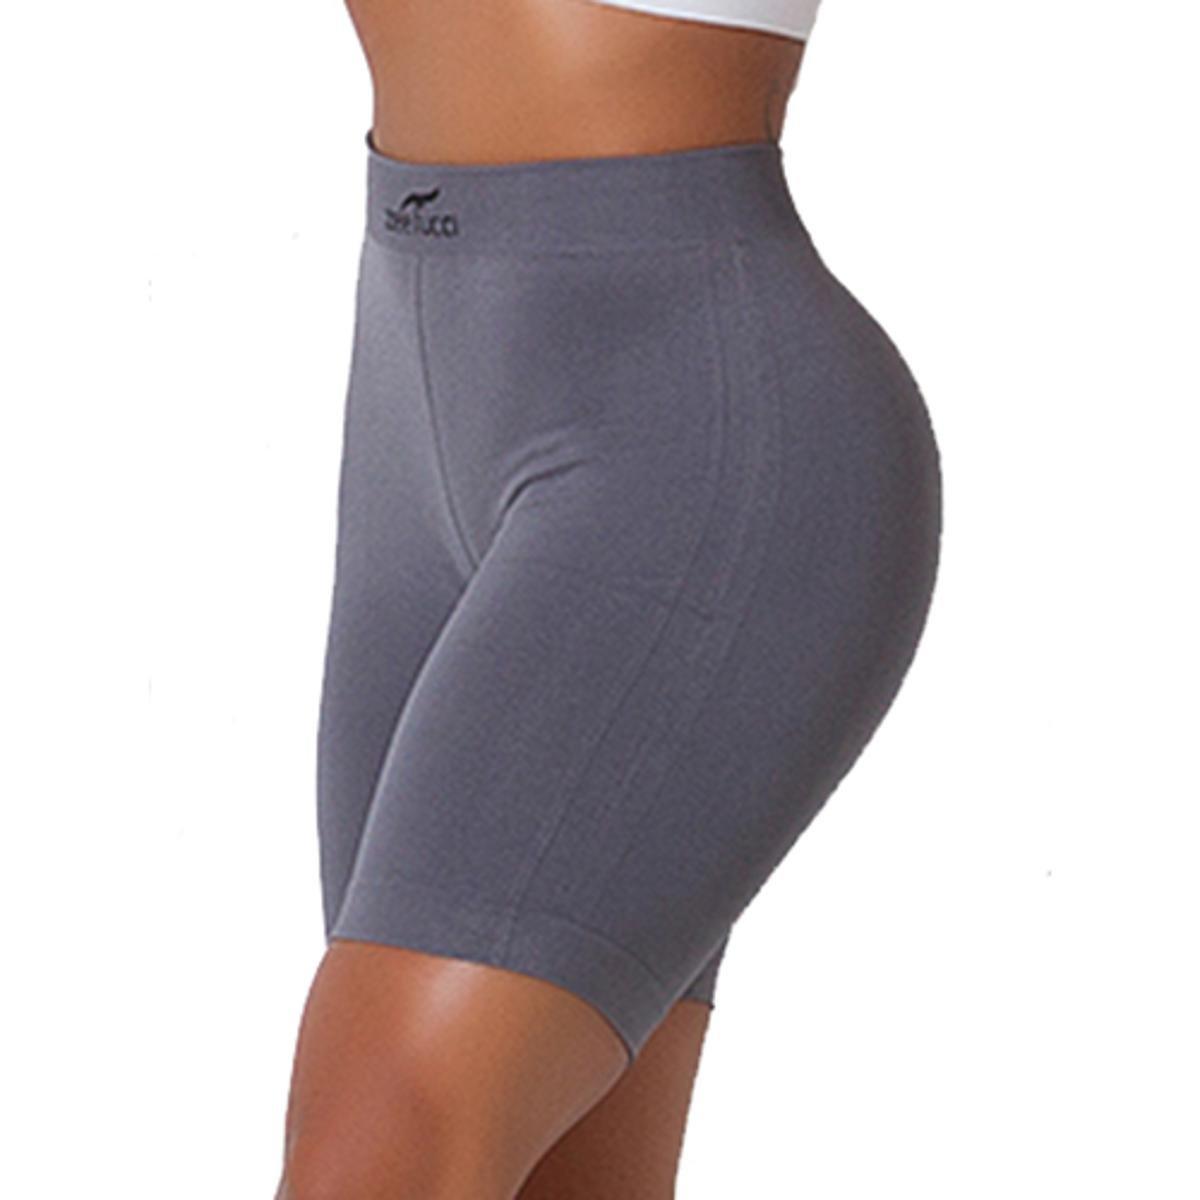 Costura Cinza Fitness Fitness Sem Sem Cinza Fitness Bermuda Sem Costura Bermuda Bermuda Y7qOa